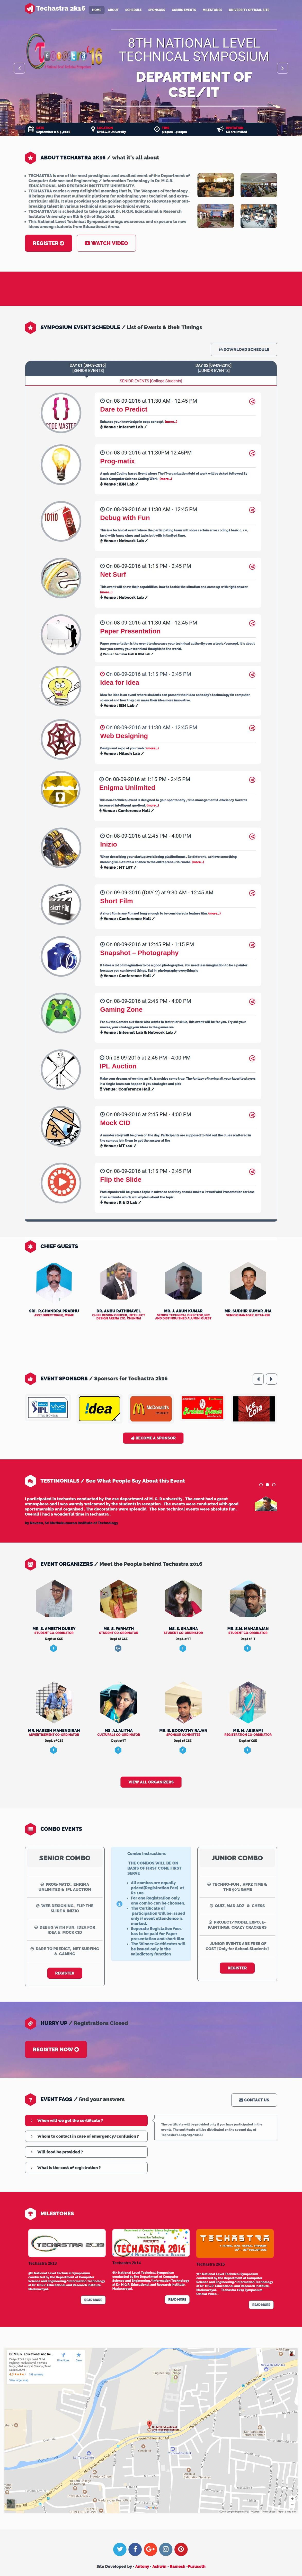 Techastra 2k16 National Level Technical Symposium Website